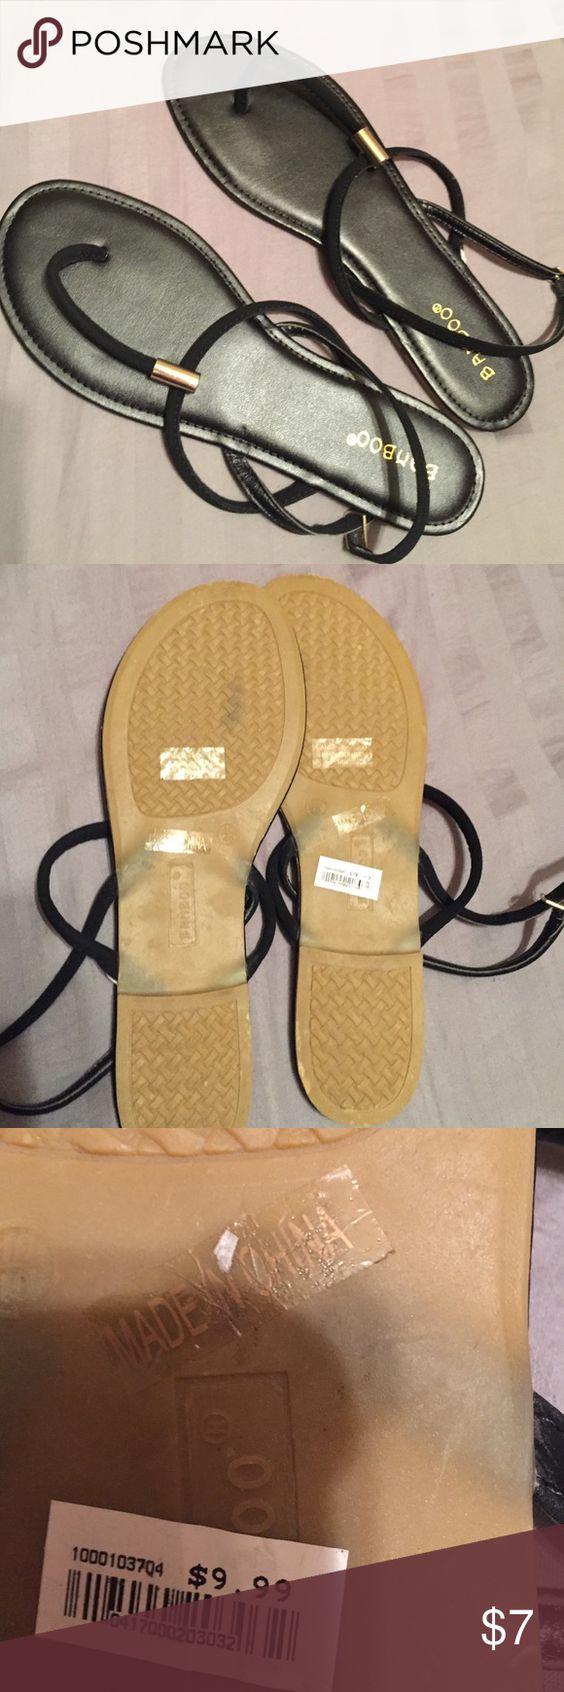 Black sandals at walmart - Black Sandals Walmart Black Sandals Walmart 37